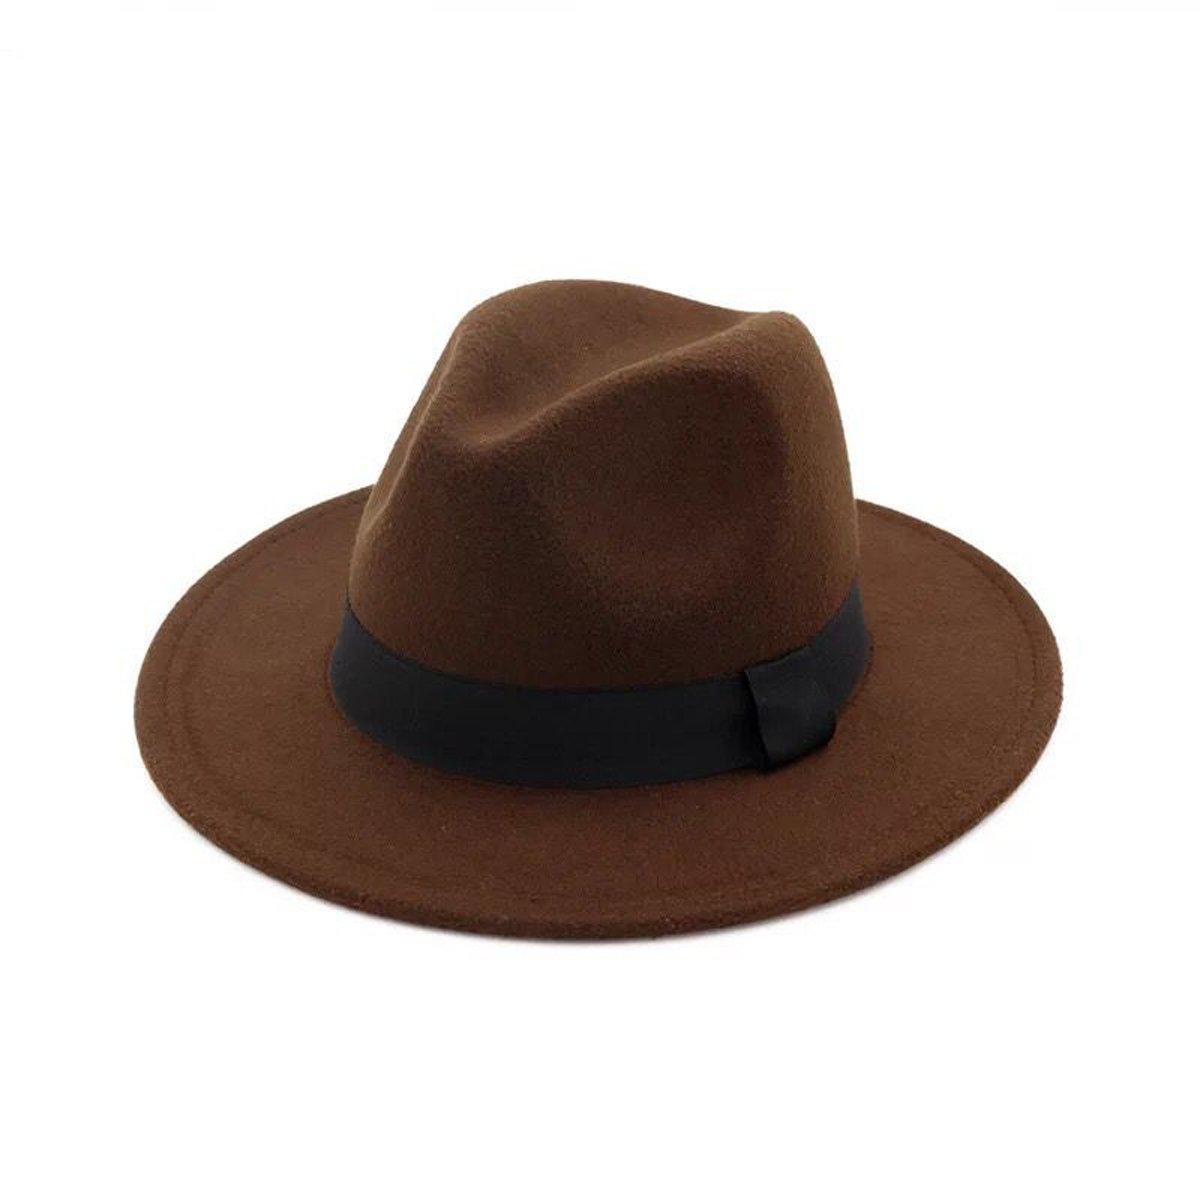 Lanzom Women Wide Brim Straw Wool Fedora Hat Retro Style Belt Panama Hat (Coffee, One Size)